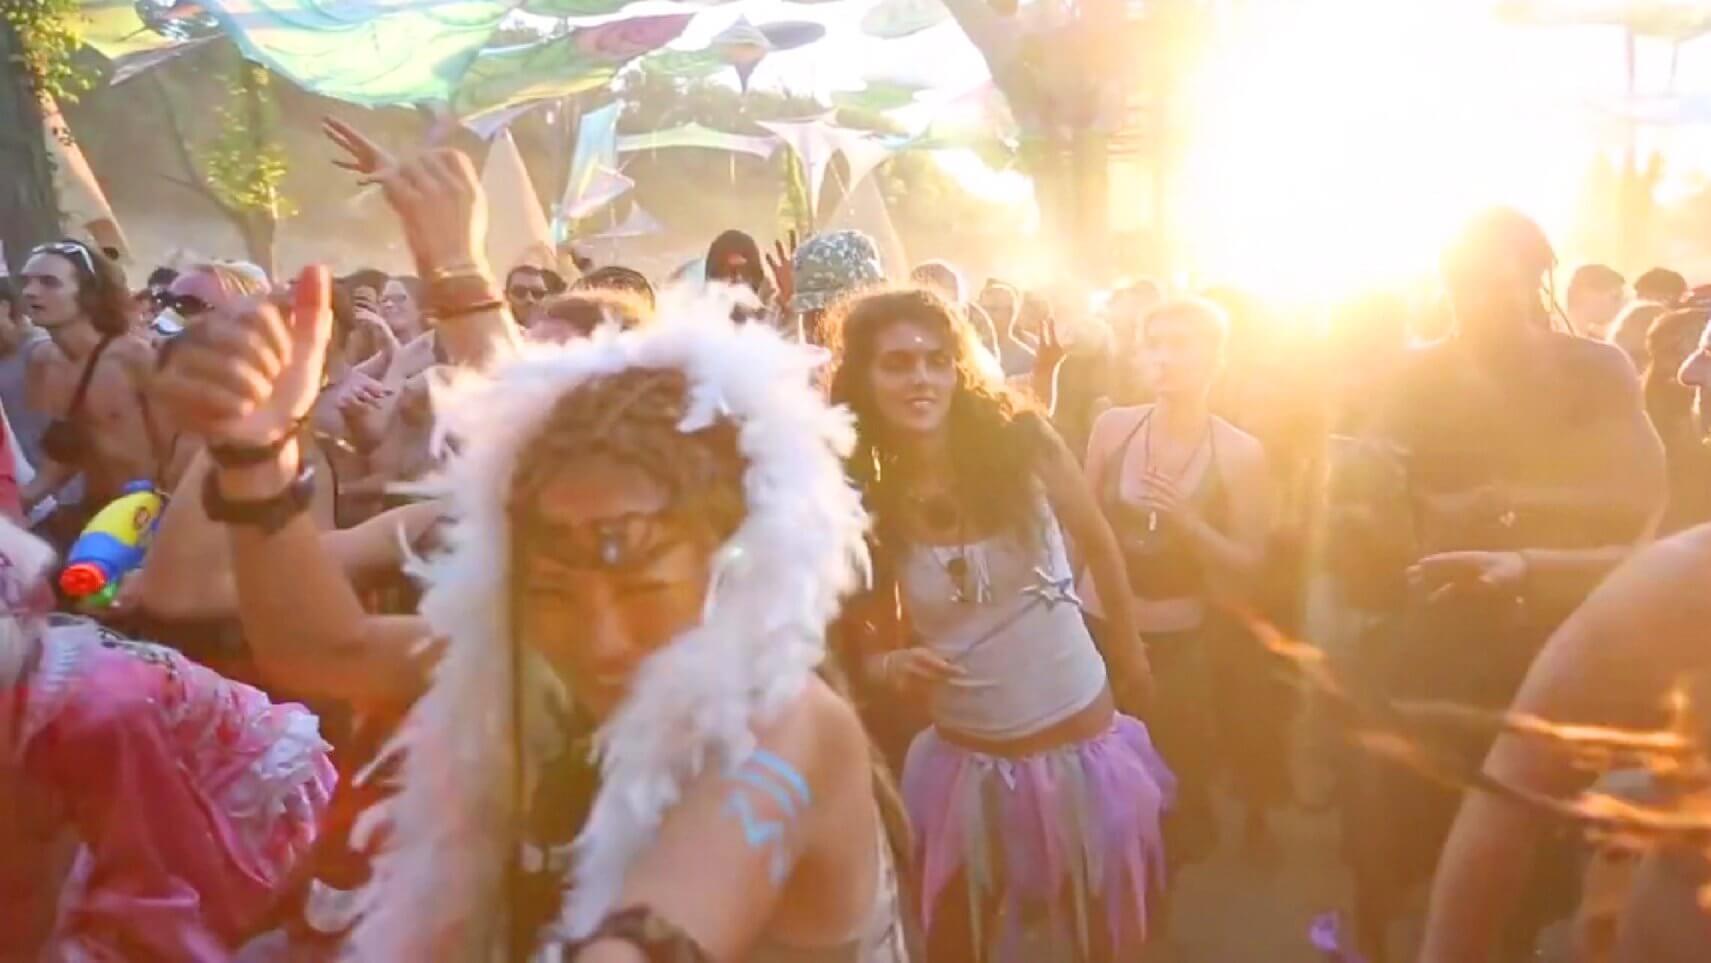 Mein Festival - Flucht in fremde Welten